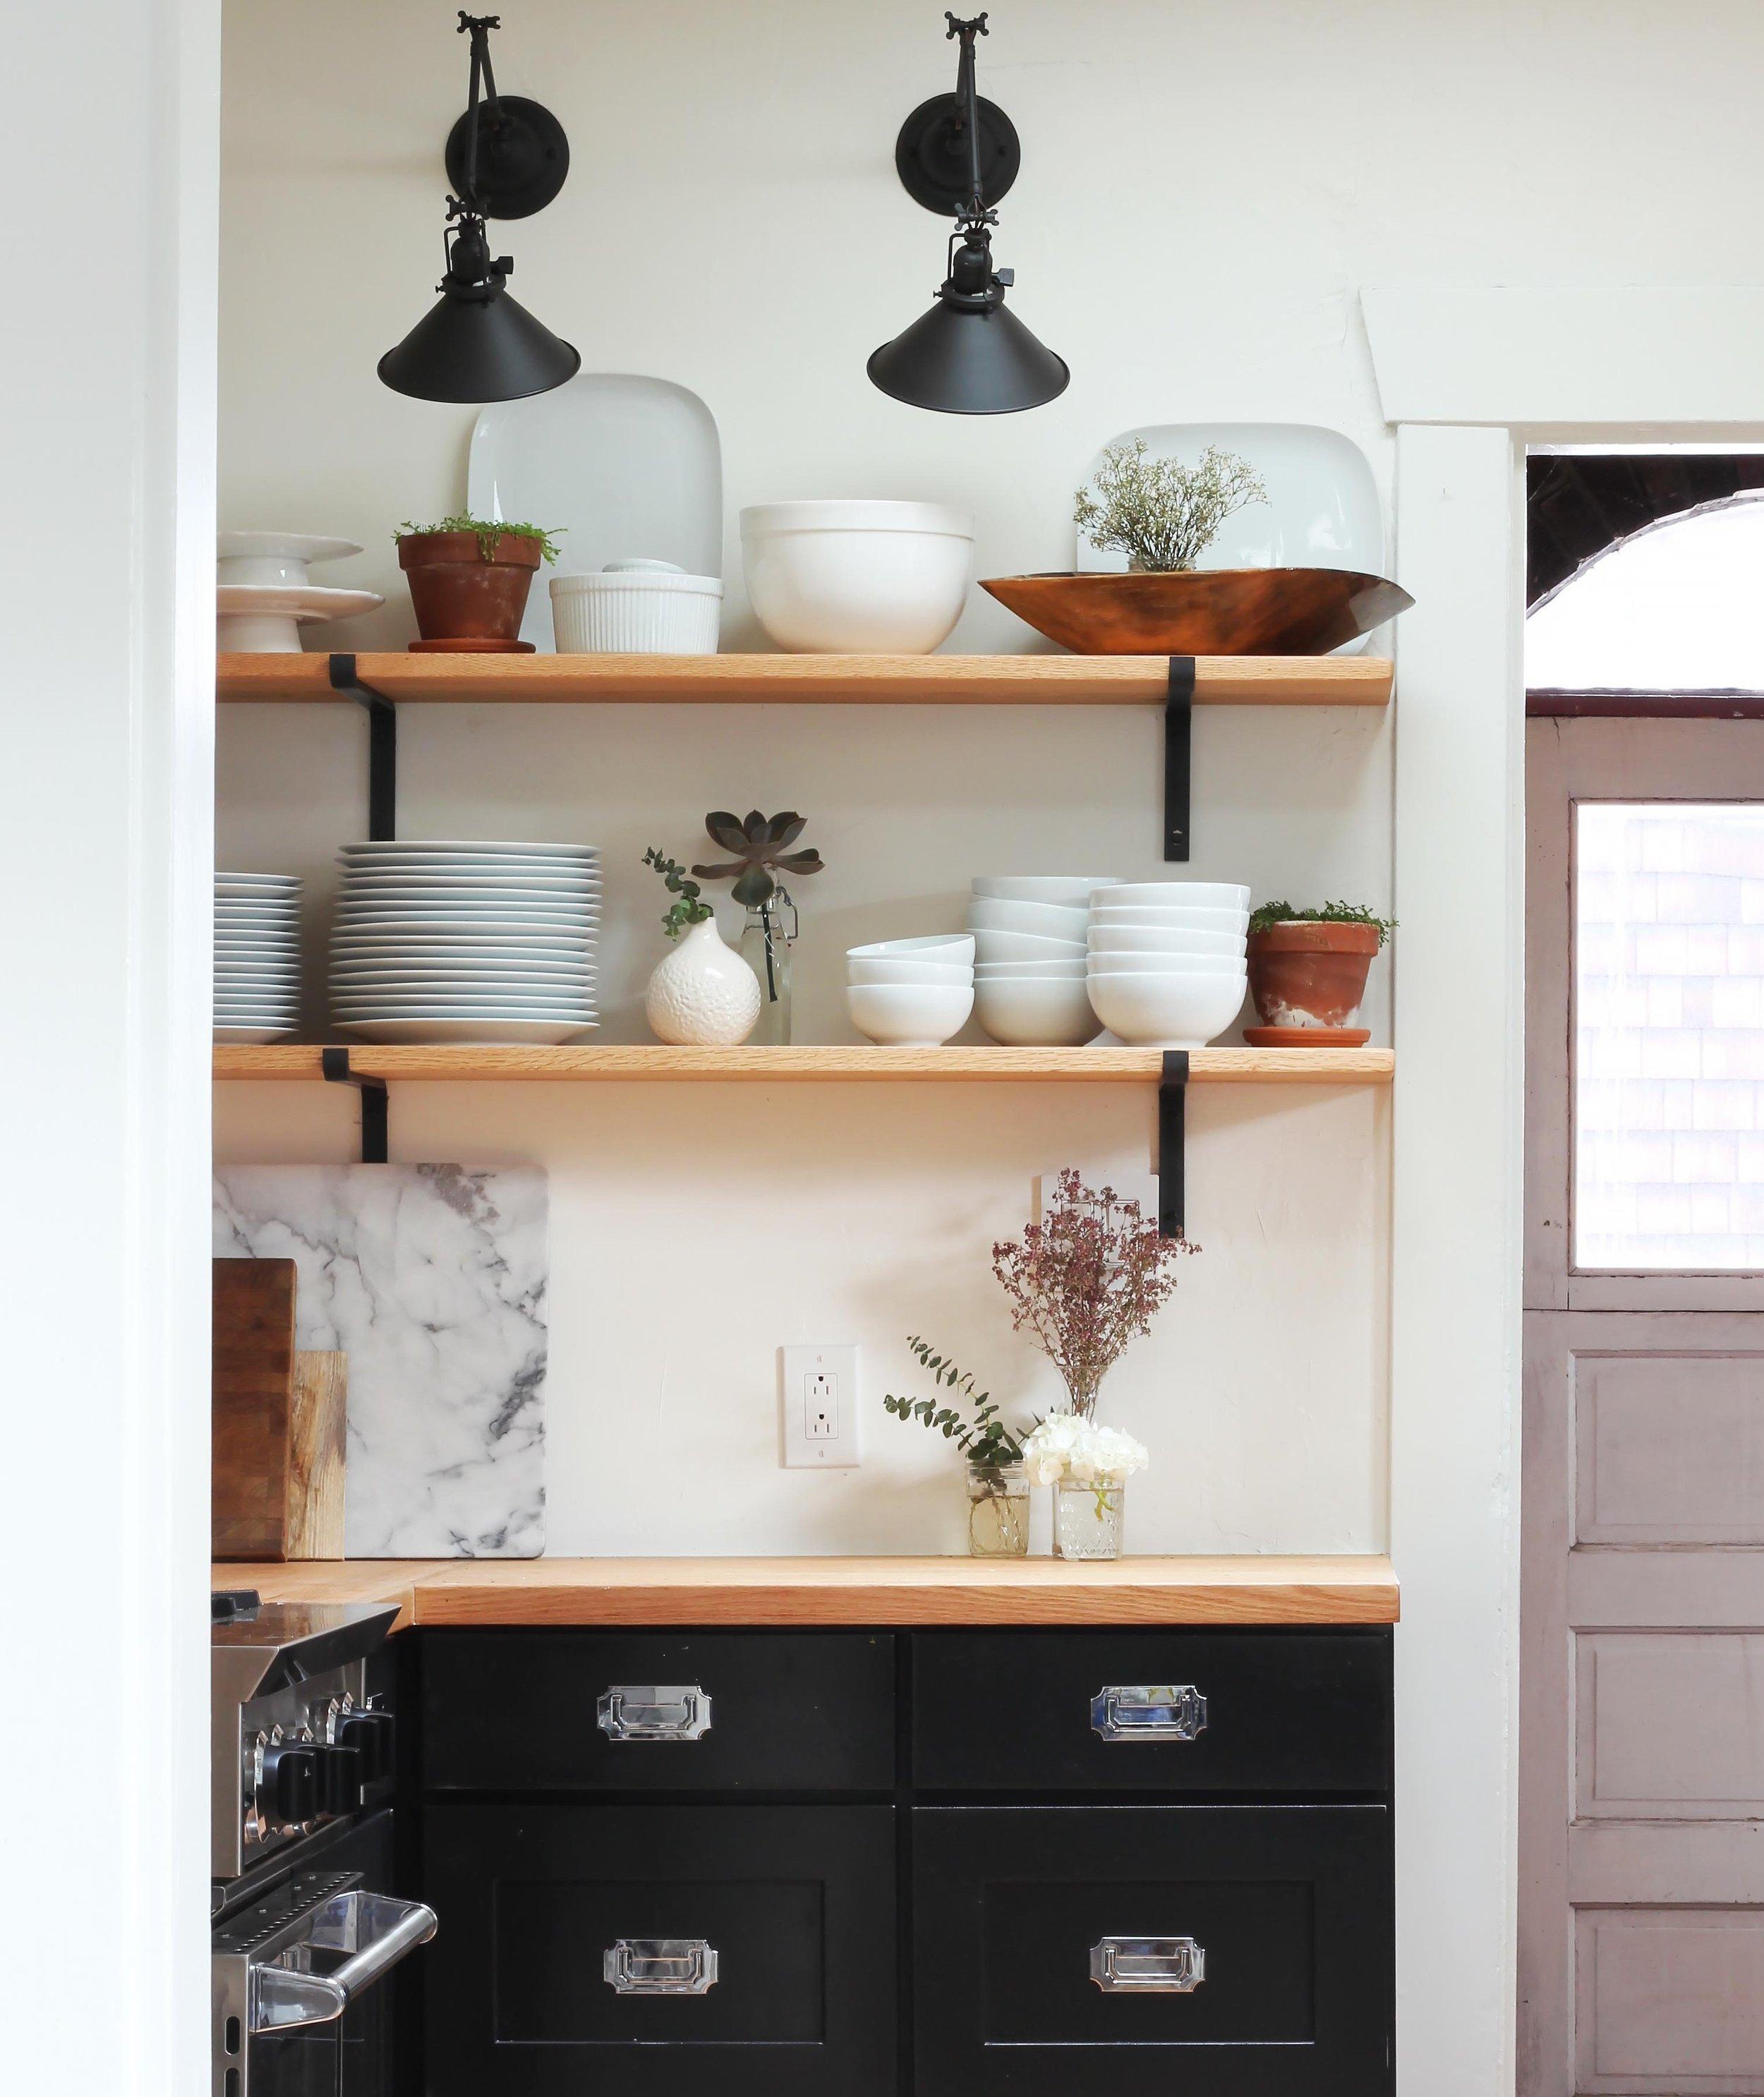 The Grit and Polish - Dexter Kitchen Renovaiton Open Shelves